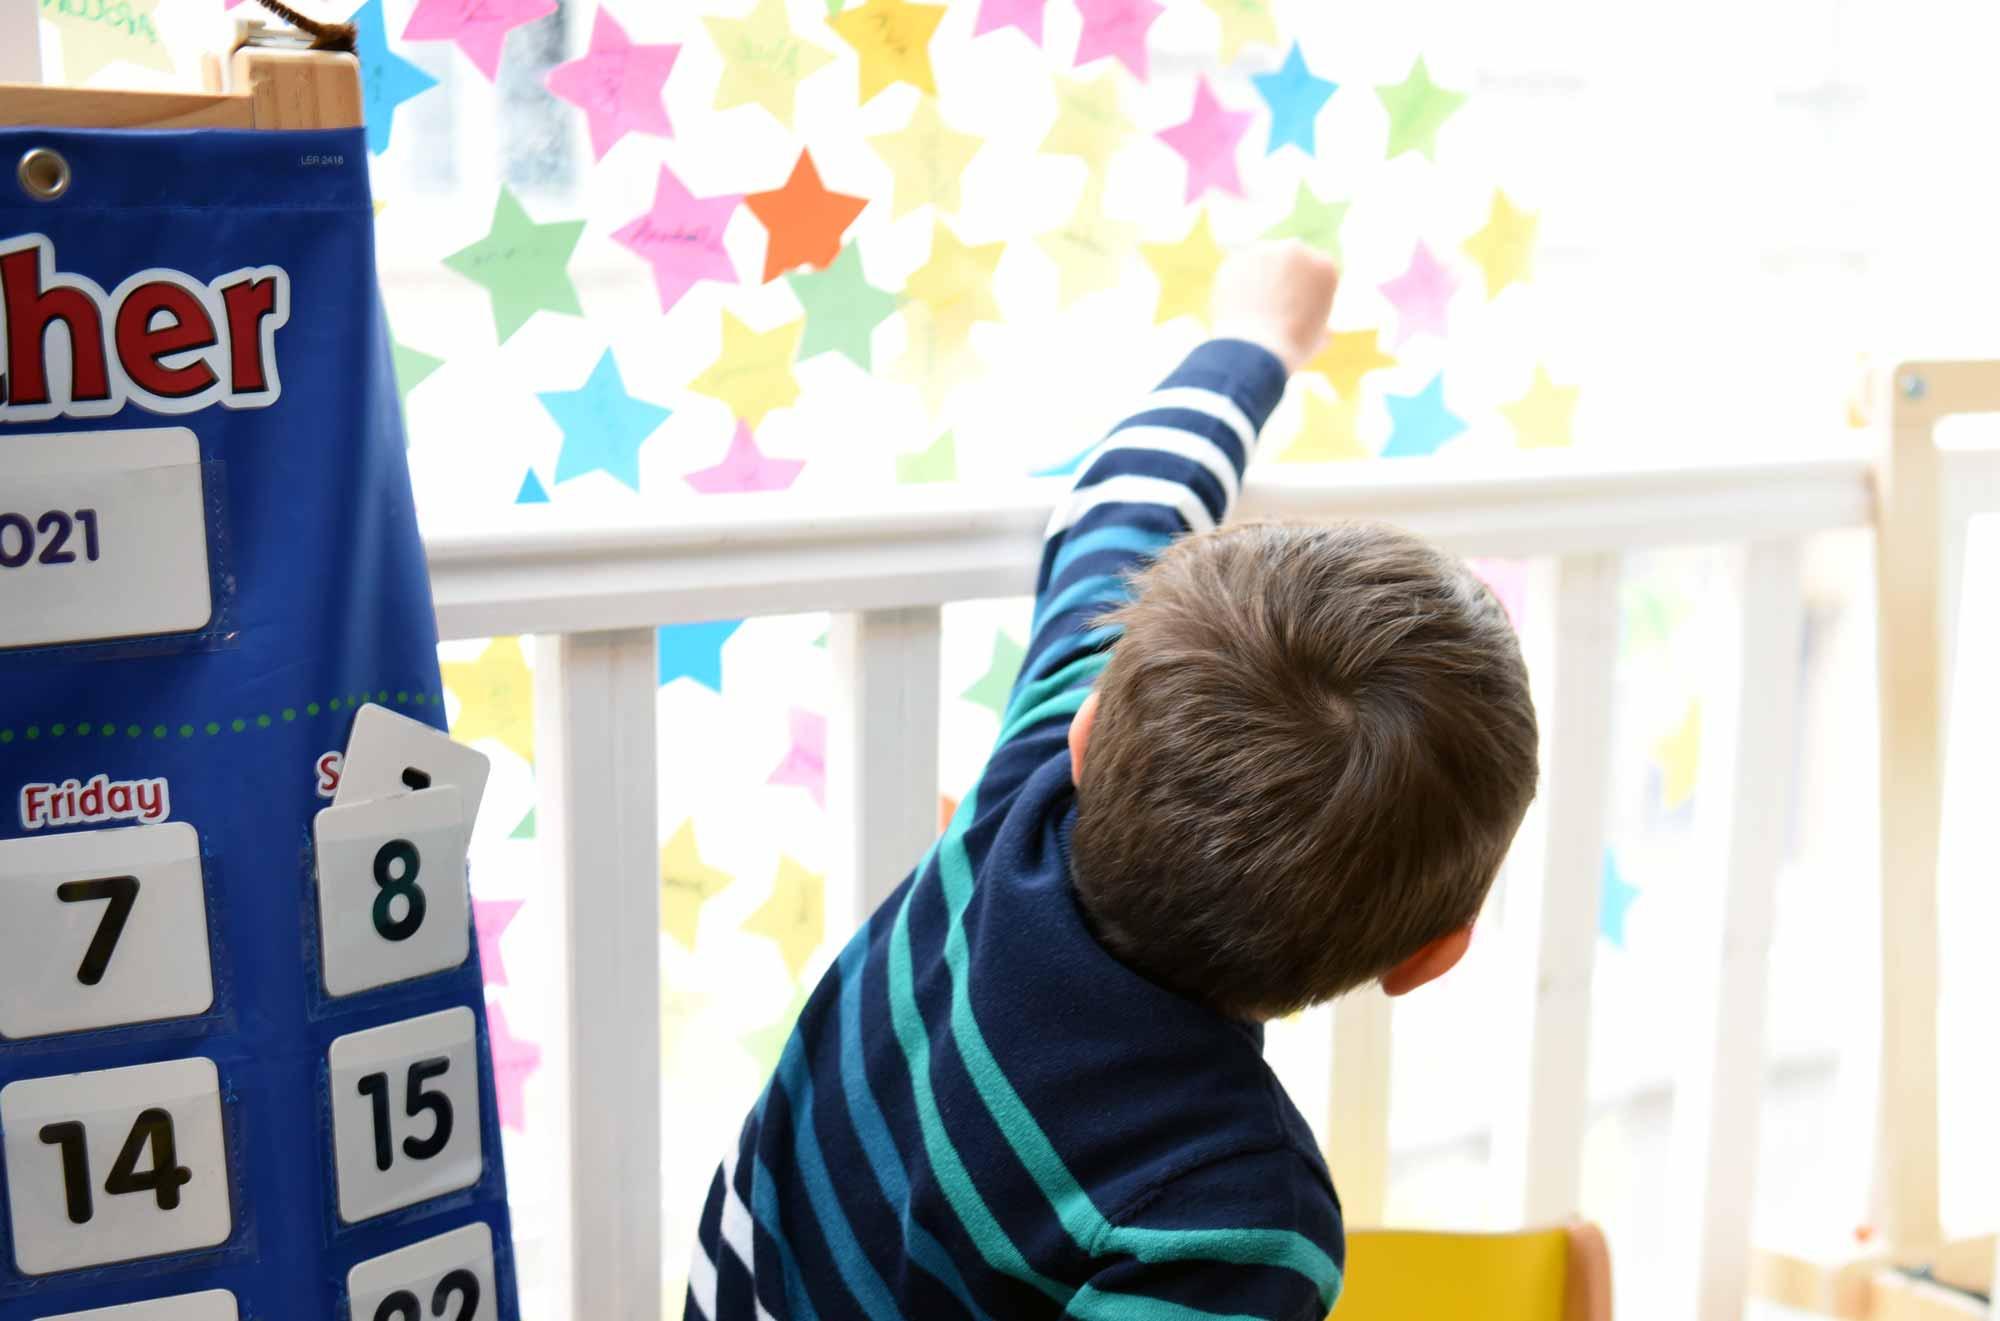 Ecole koenig child growing to stars